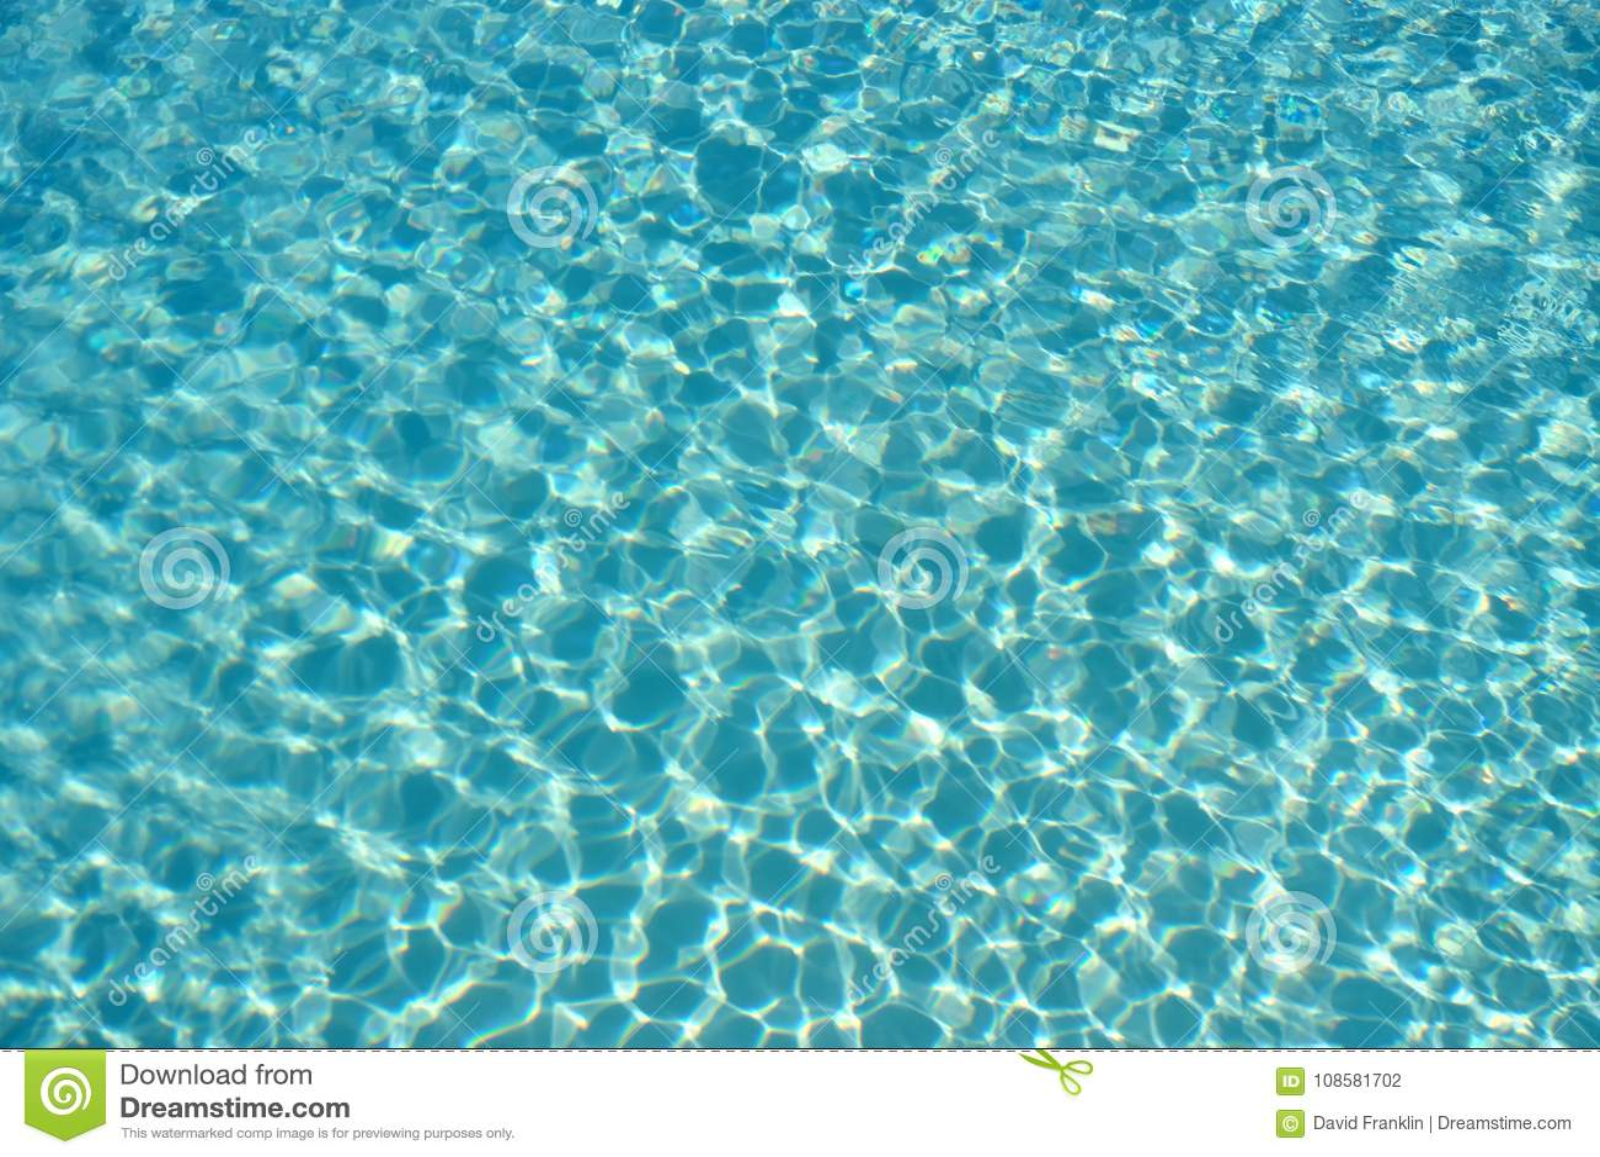 Fondo abstracto superficial reflector ligero del agua de la piscina